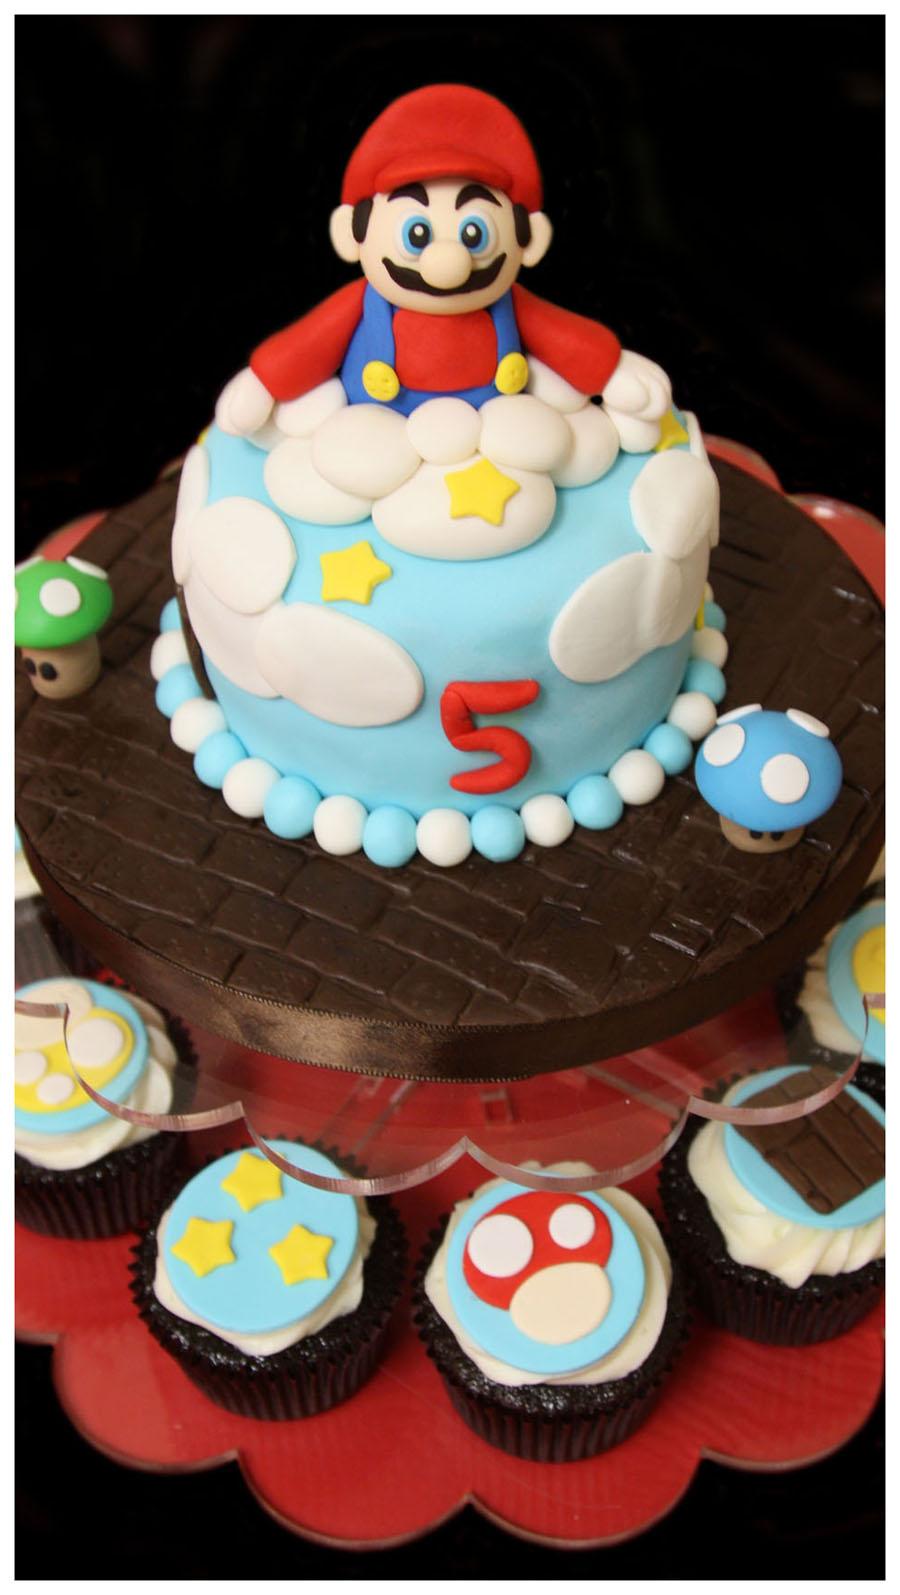 Sugarbabies Cupcake Gallery Sugarbabies Cakes Amp Cupcakes